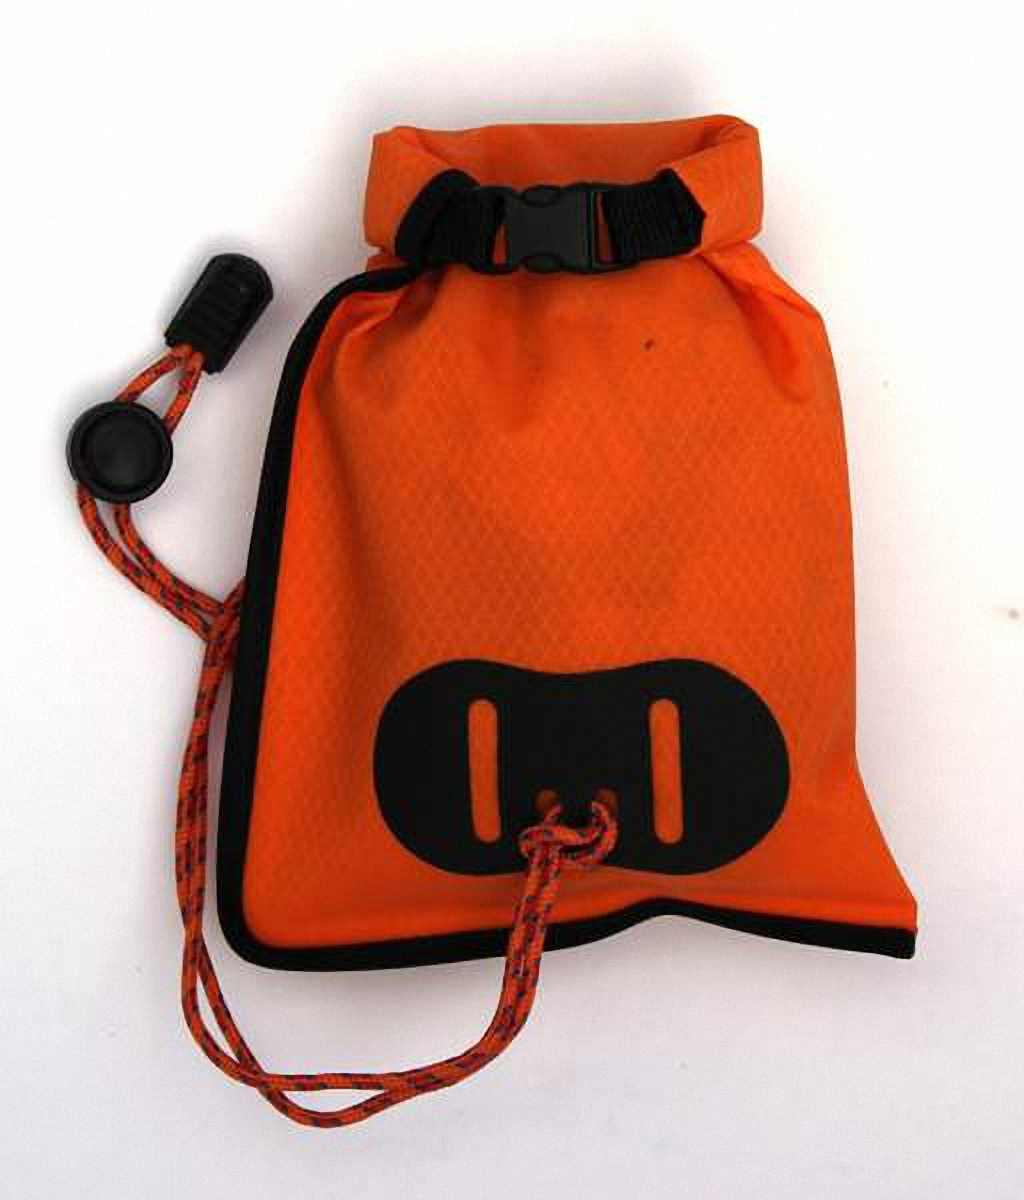 Водонепроницаемый гермомешок Aquapac 036 - Small Stormproof Pouch Orange.. Aquapac - №1 в мире водонепроницаемых чехлов и сумок. Фото 1